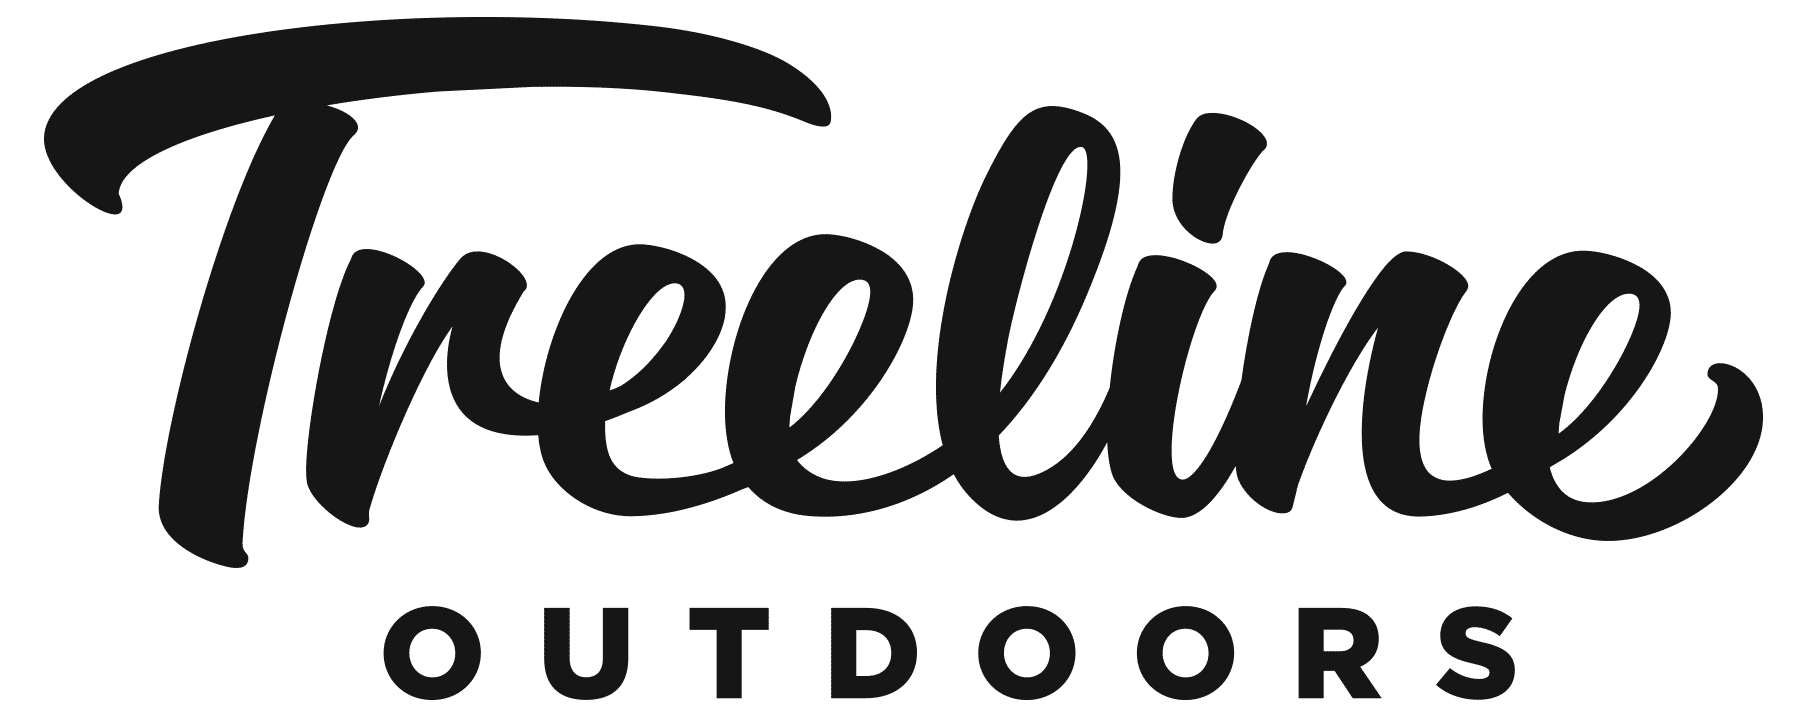 Treeline Outdoors : Tents & Accessories